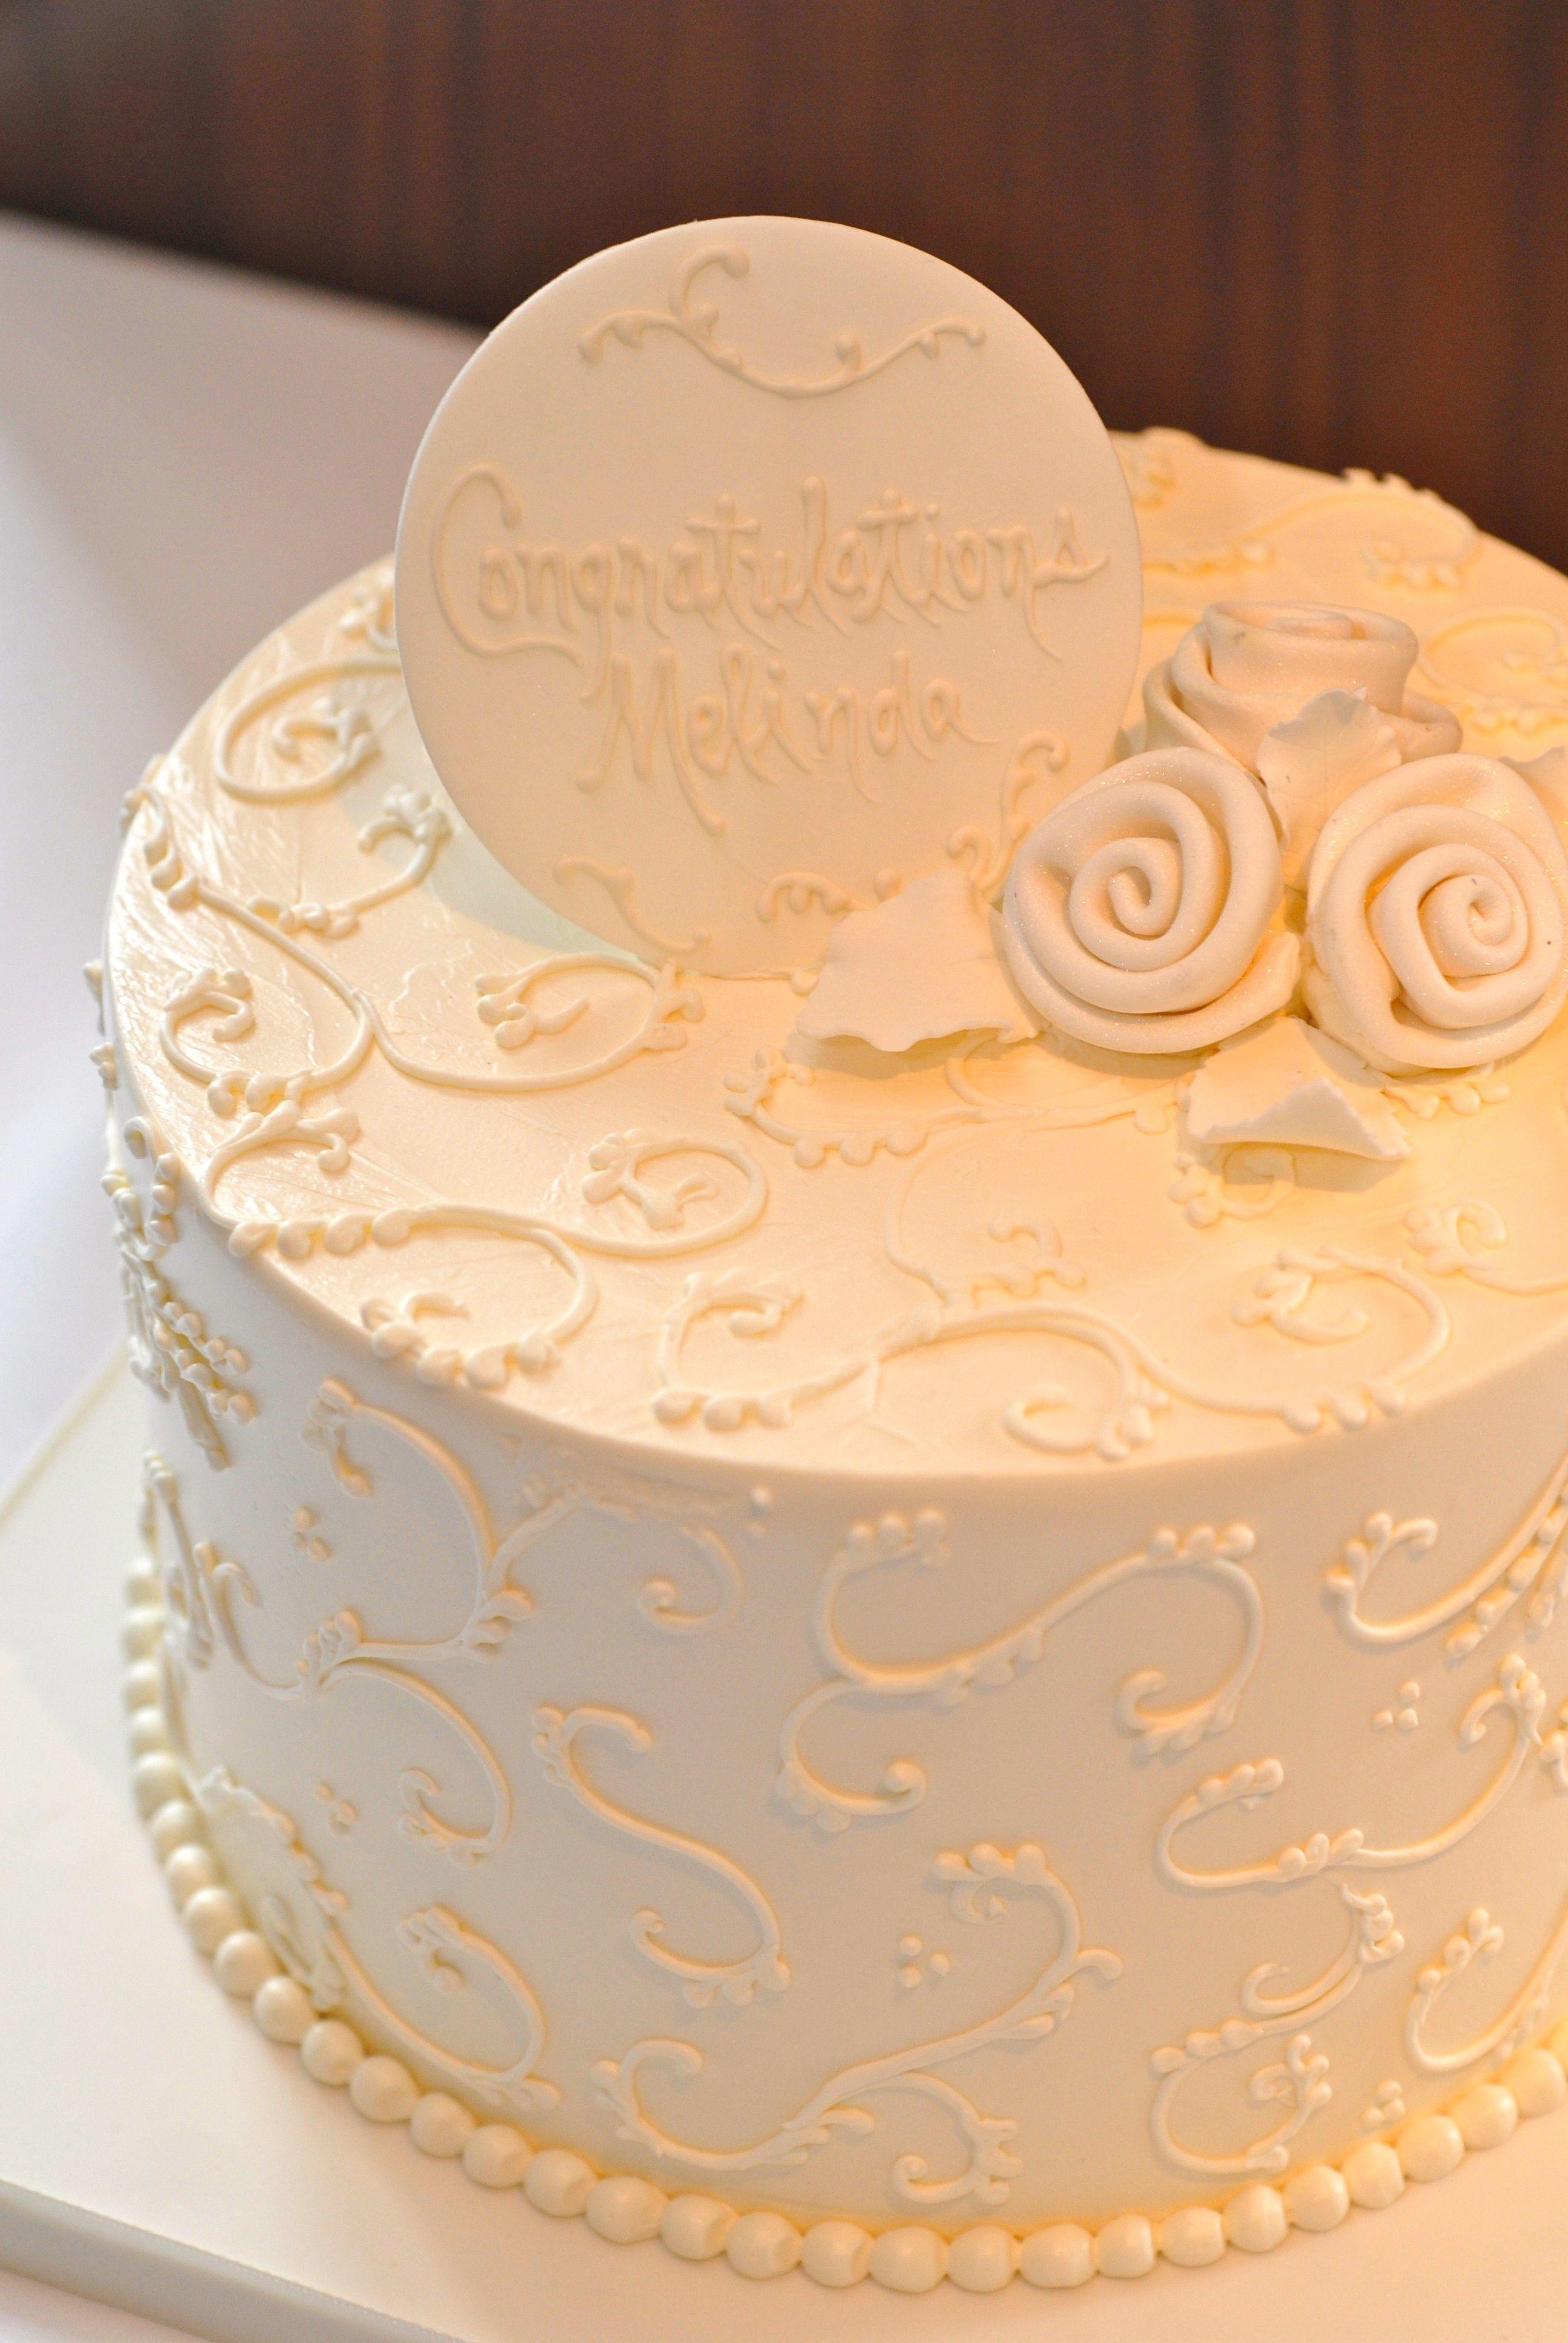 Wedding Shower Cake, Pastry Chef Mary Winslow. Photo by Cindy Kurman ...